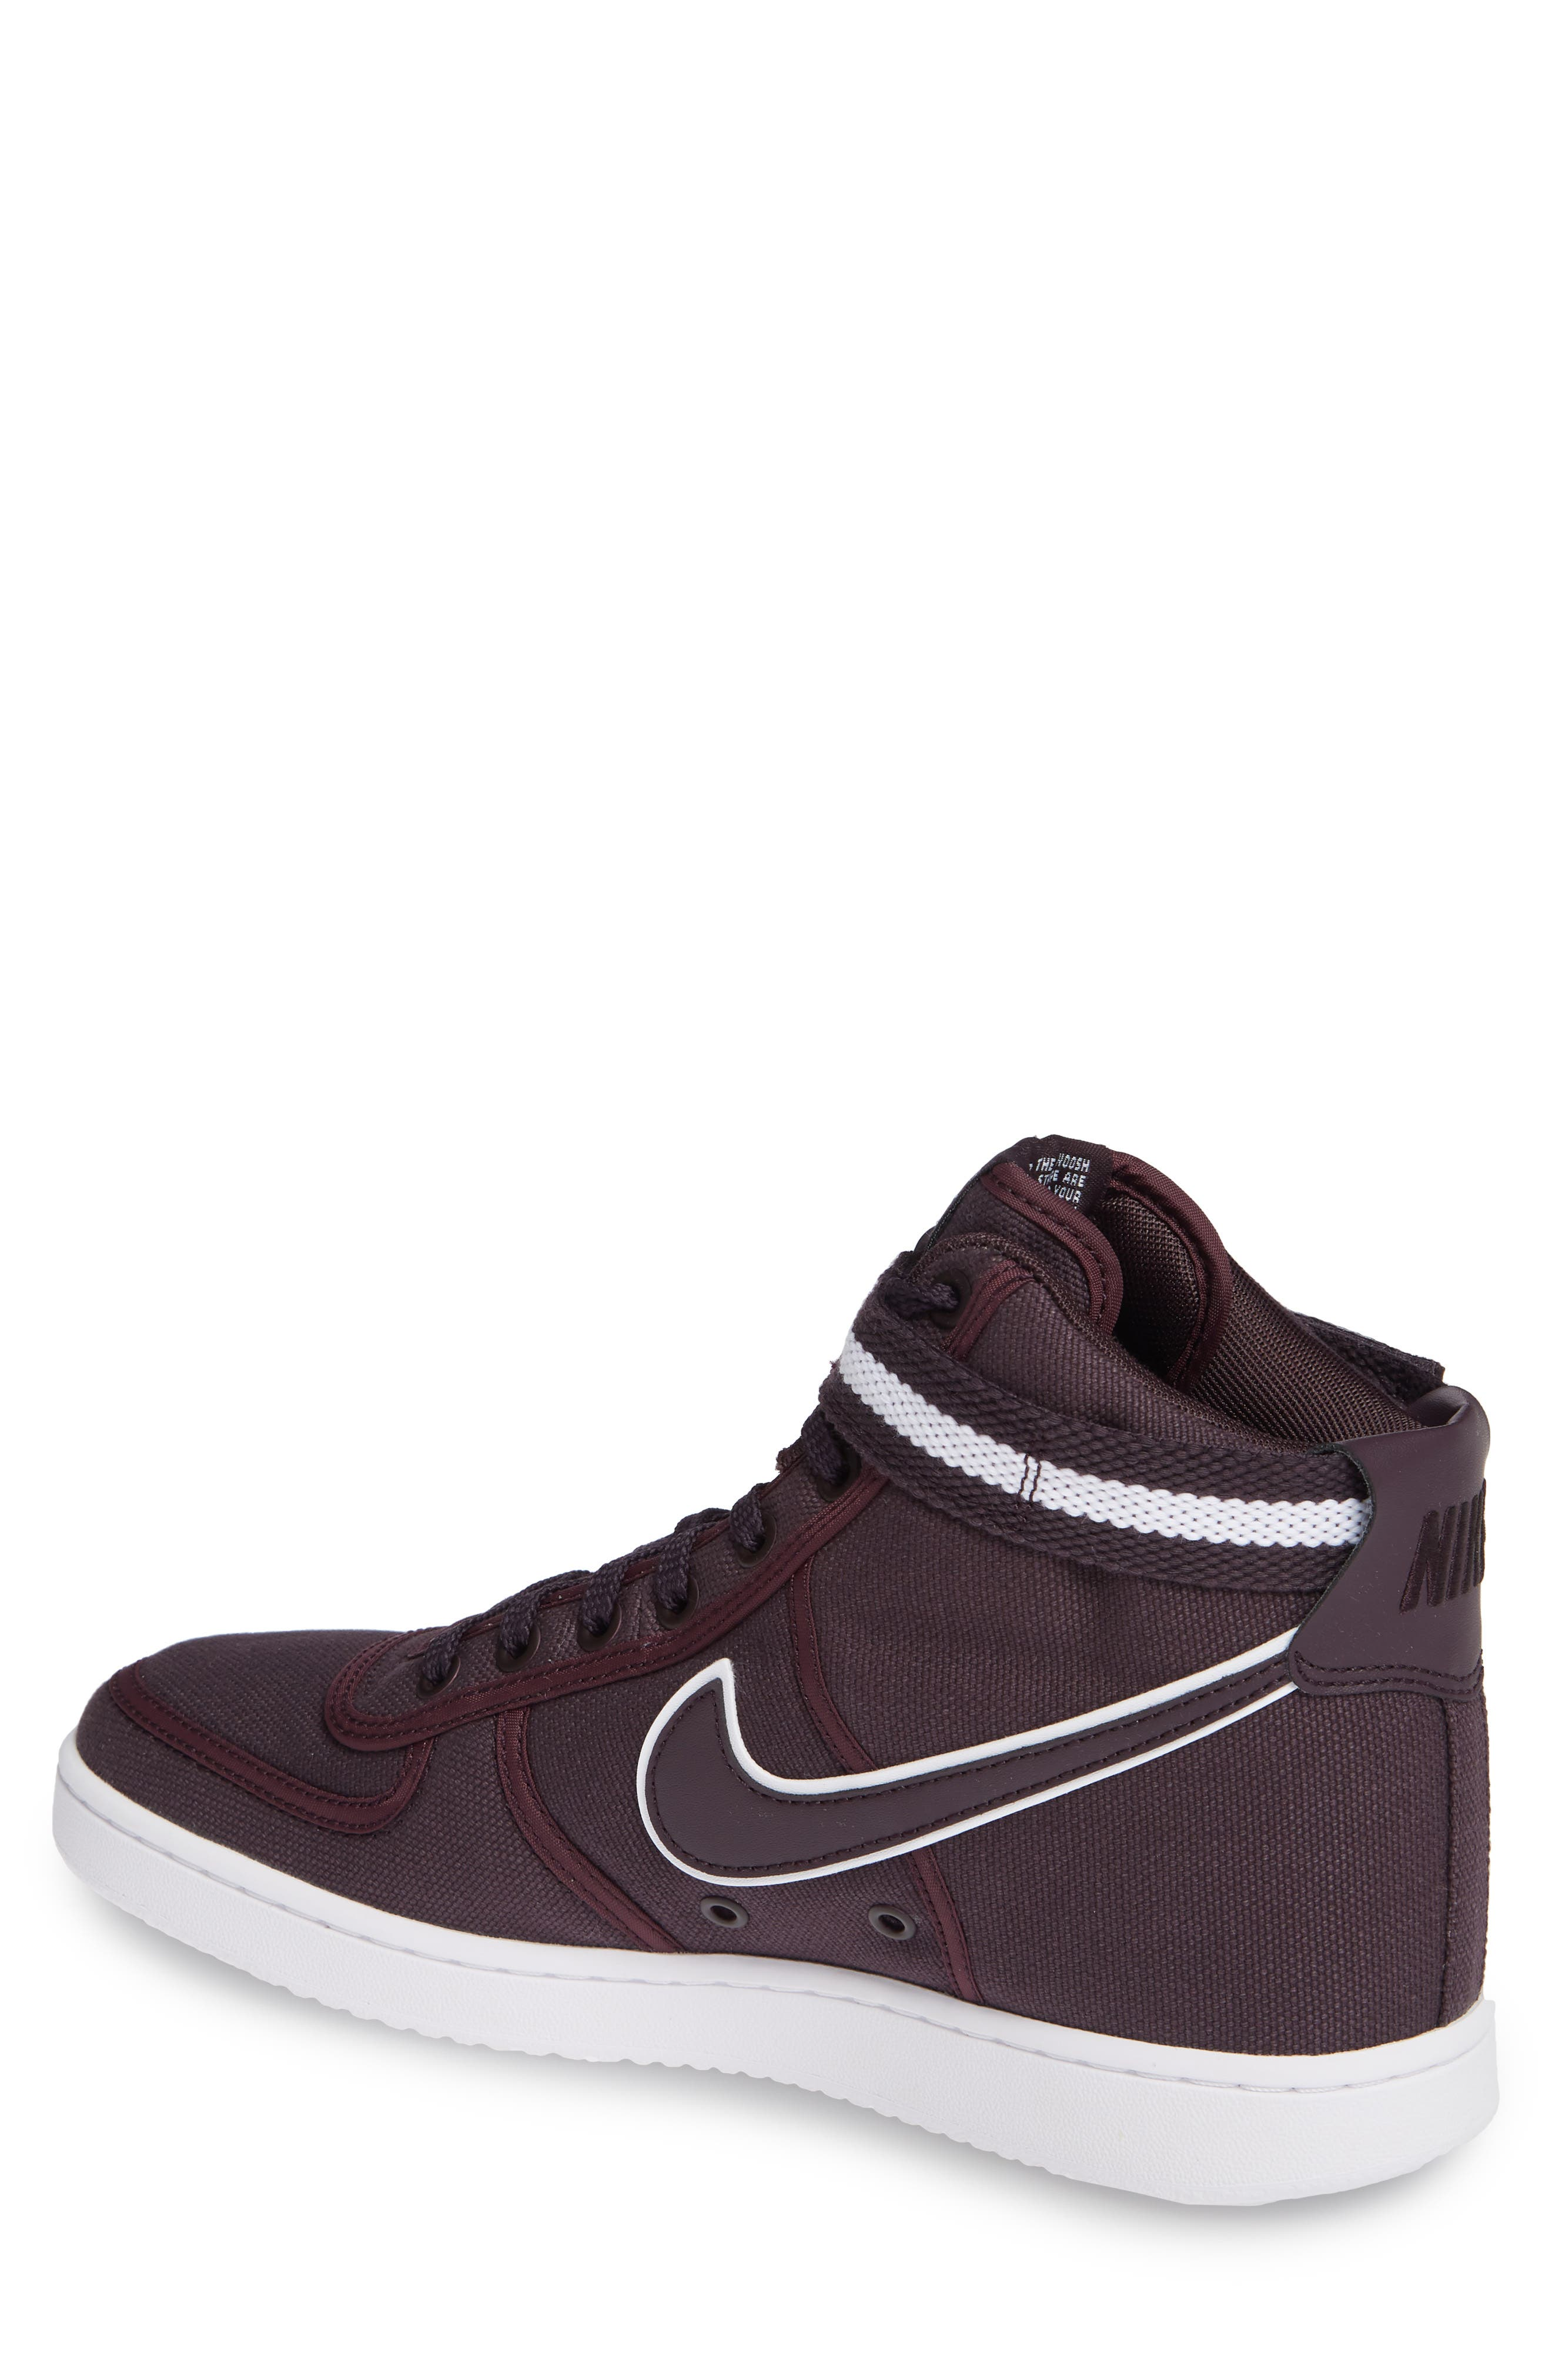 Vandal High Supreme High Top Sneaker,                             Alternate thumbnail 2, color,                             Burgundy Ash/ White